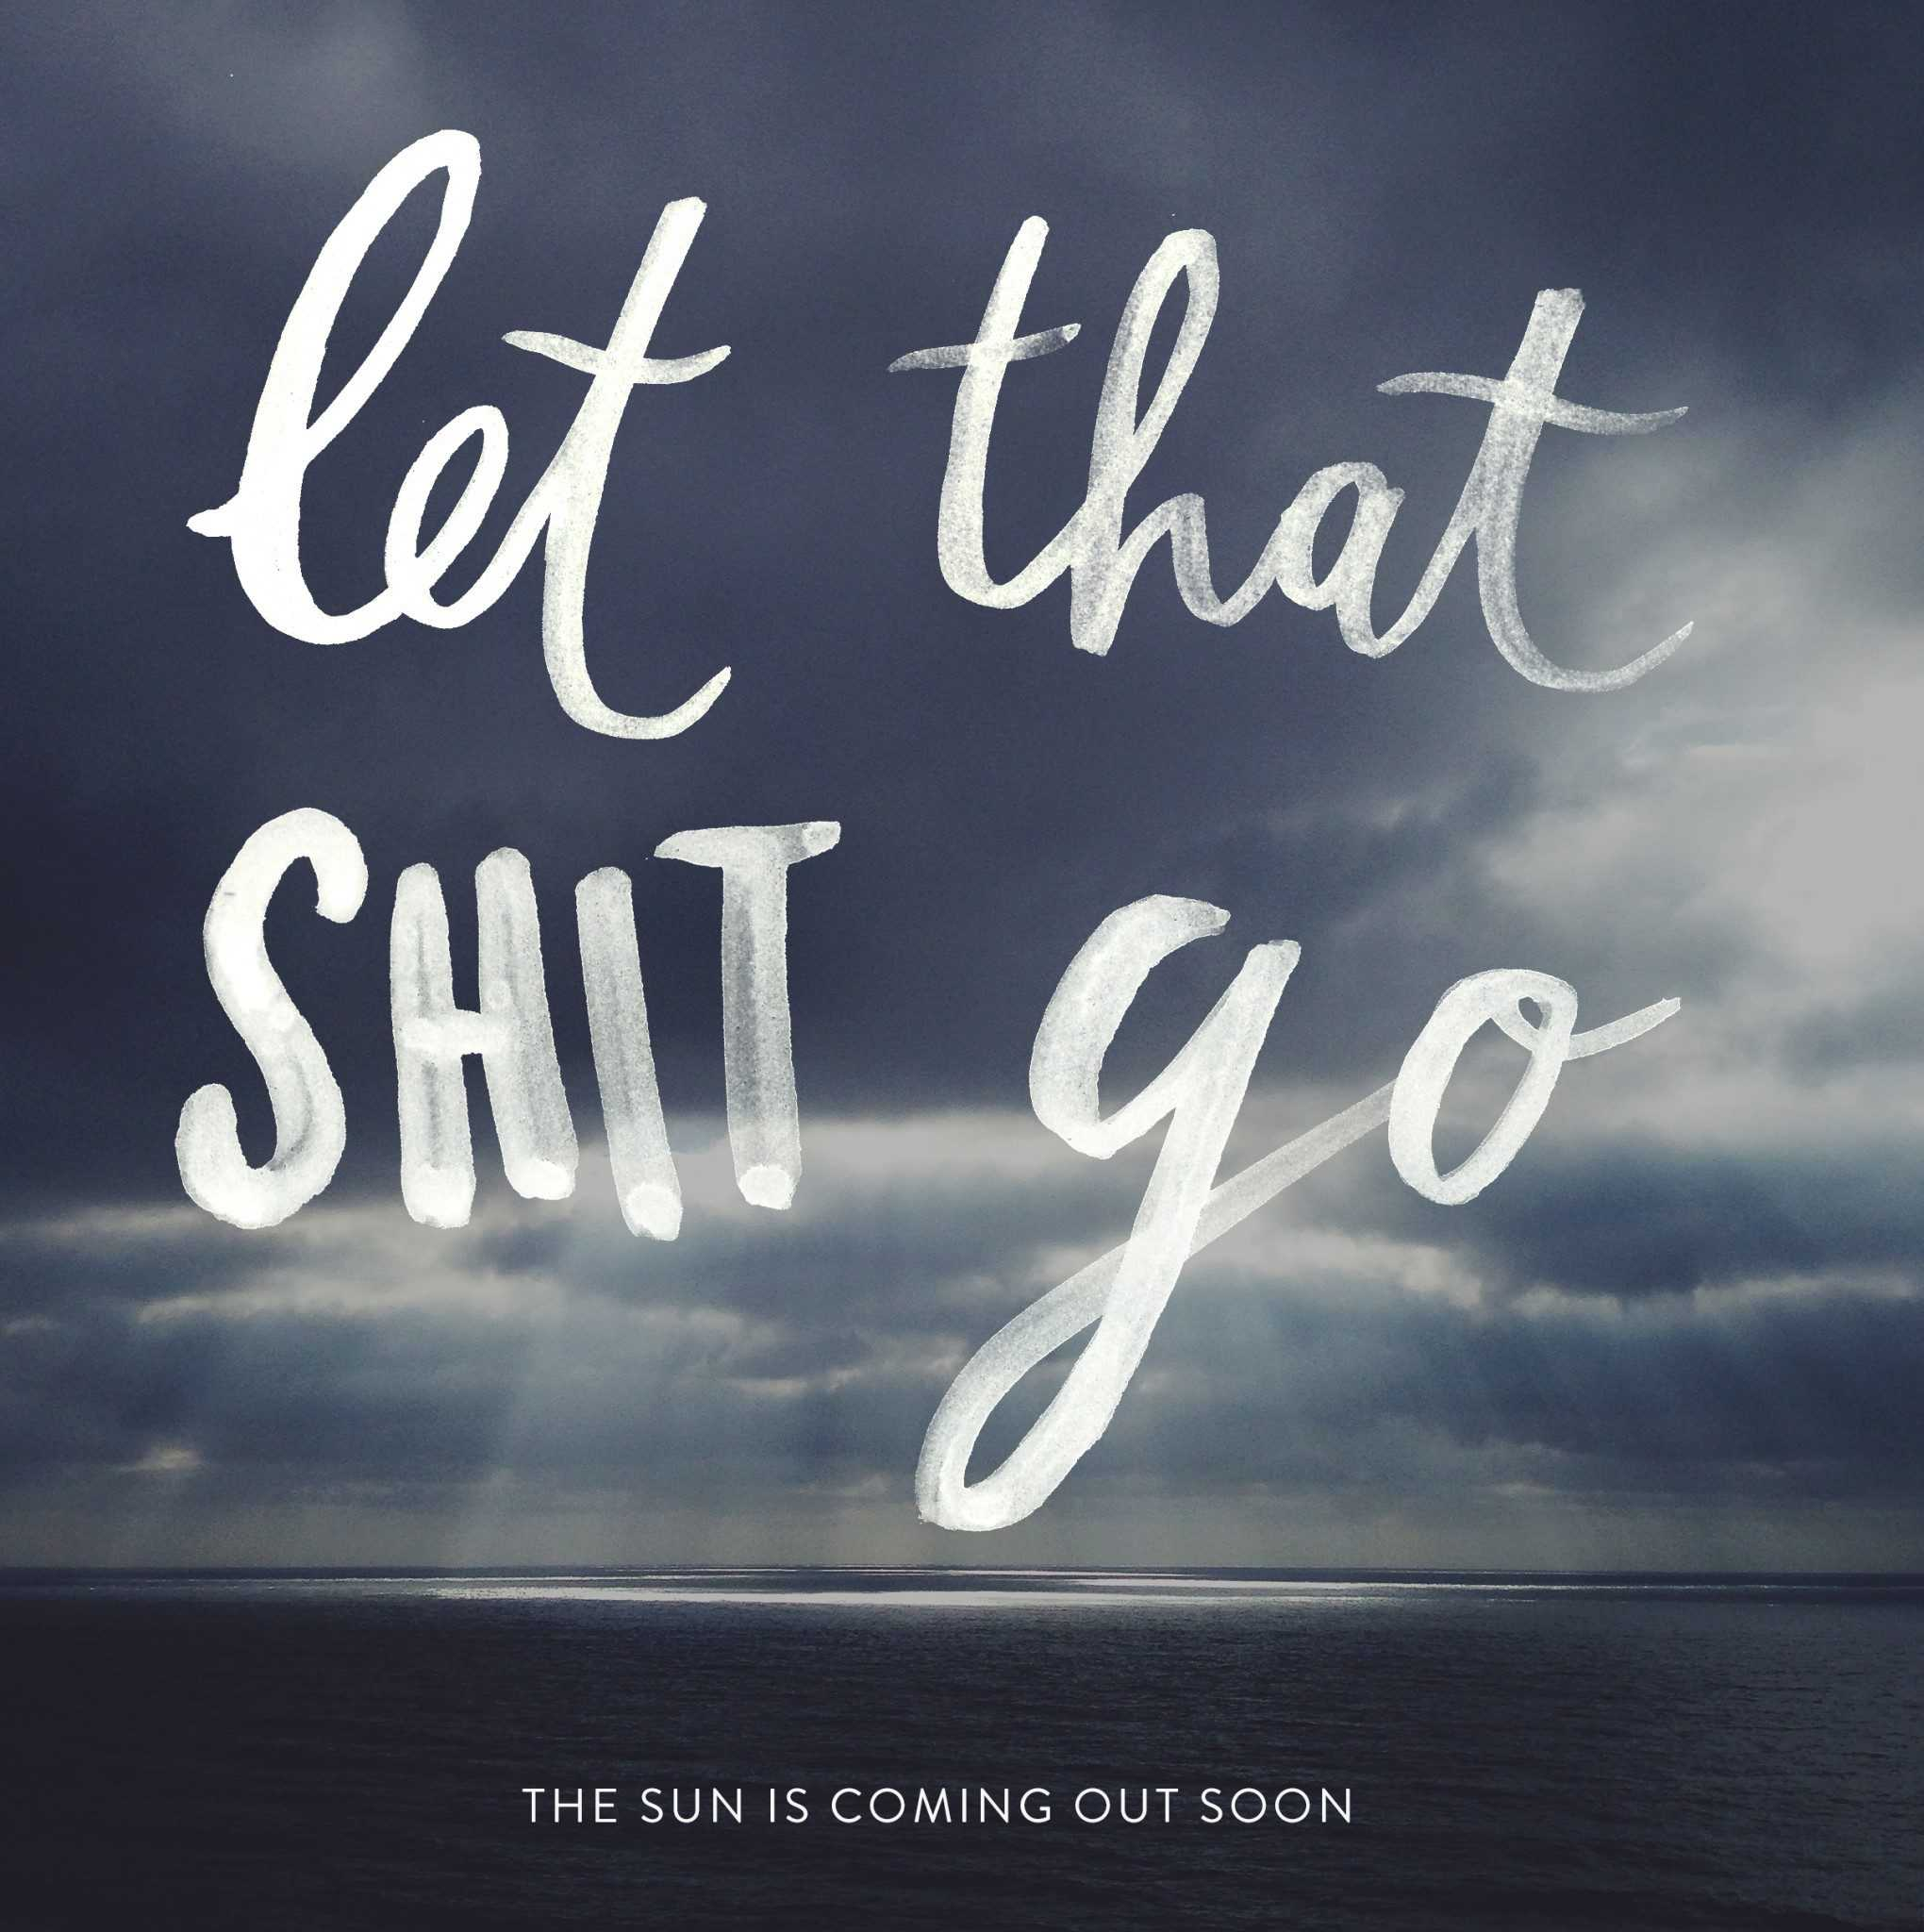 let-that-shit-go